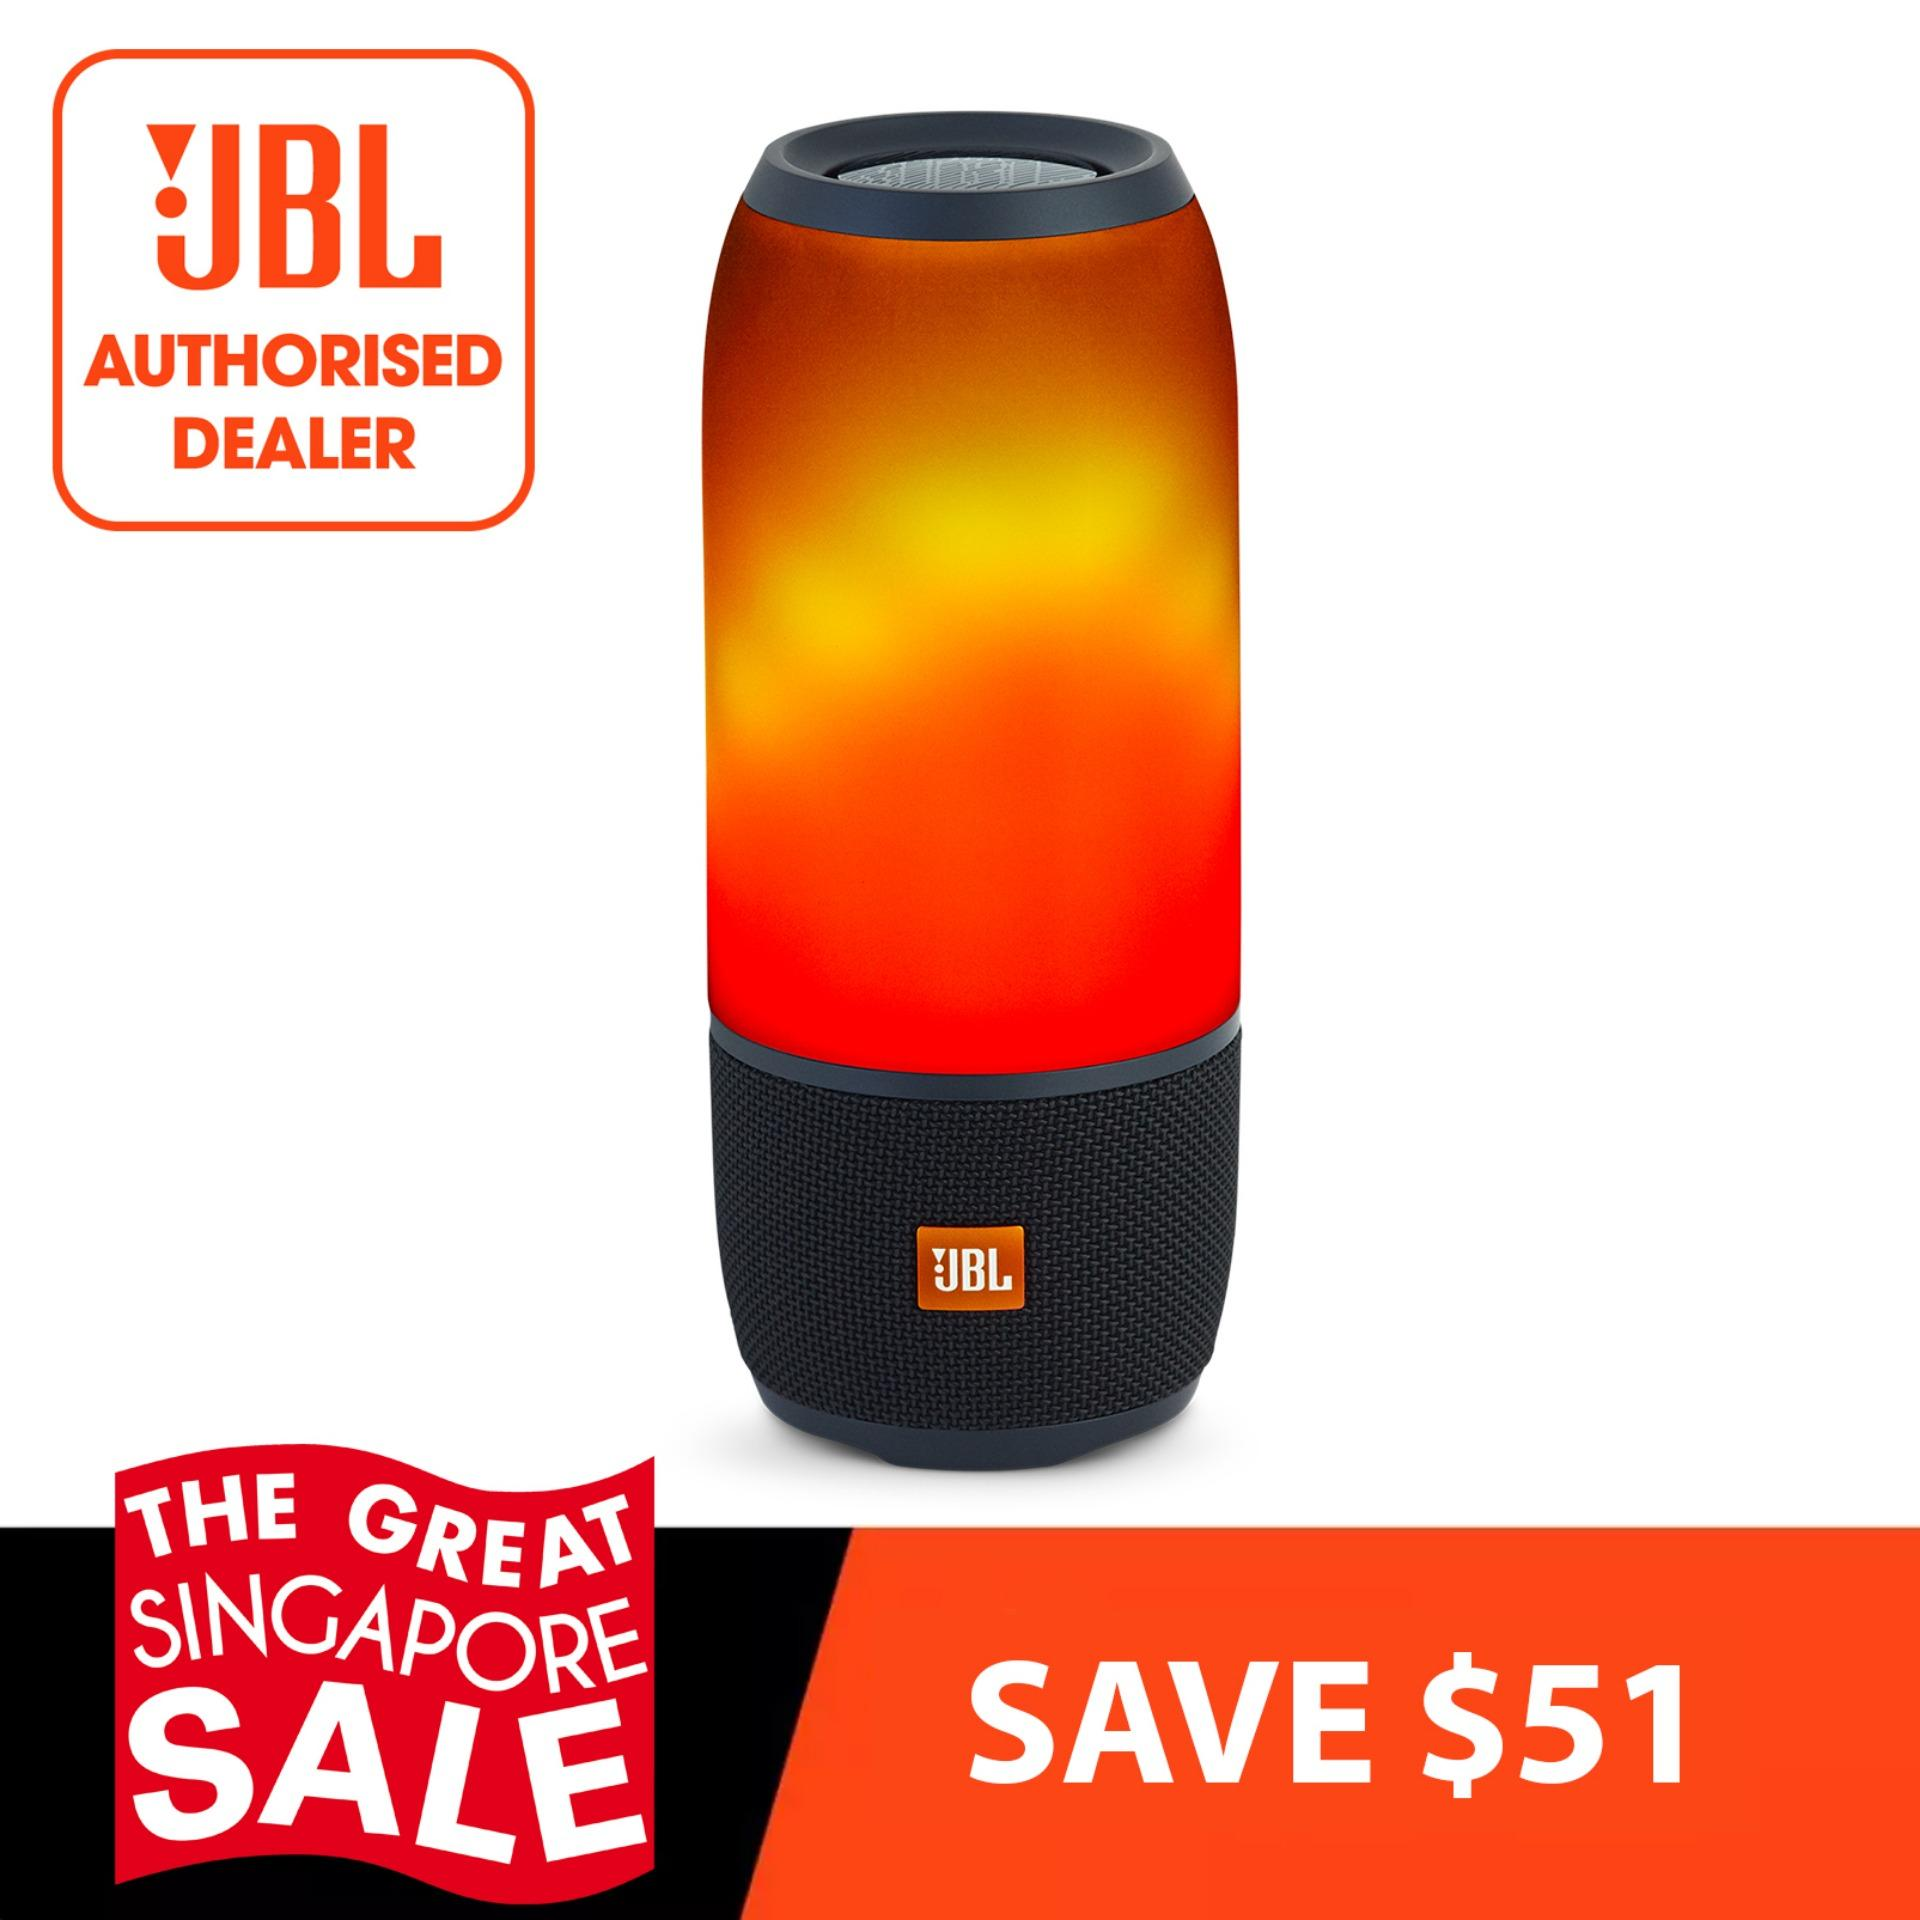 Brand New Jbl Pulse 3 Portable Bluetooth Speaker